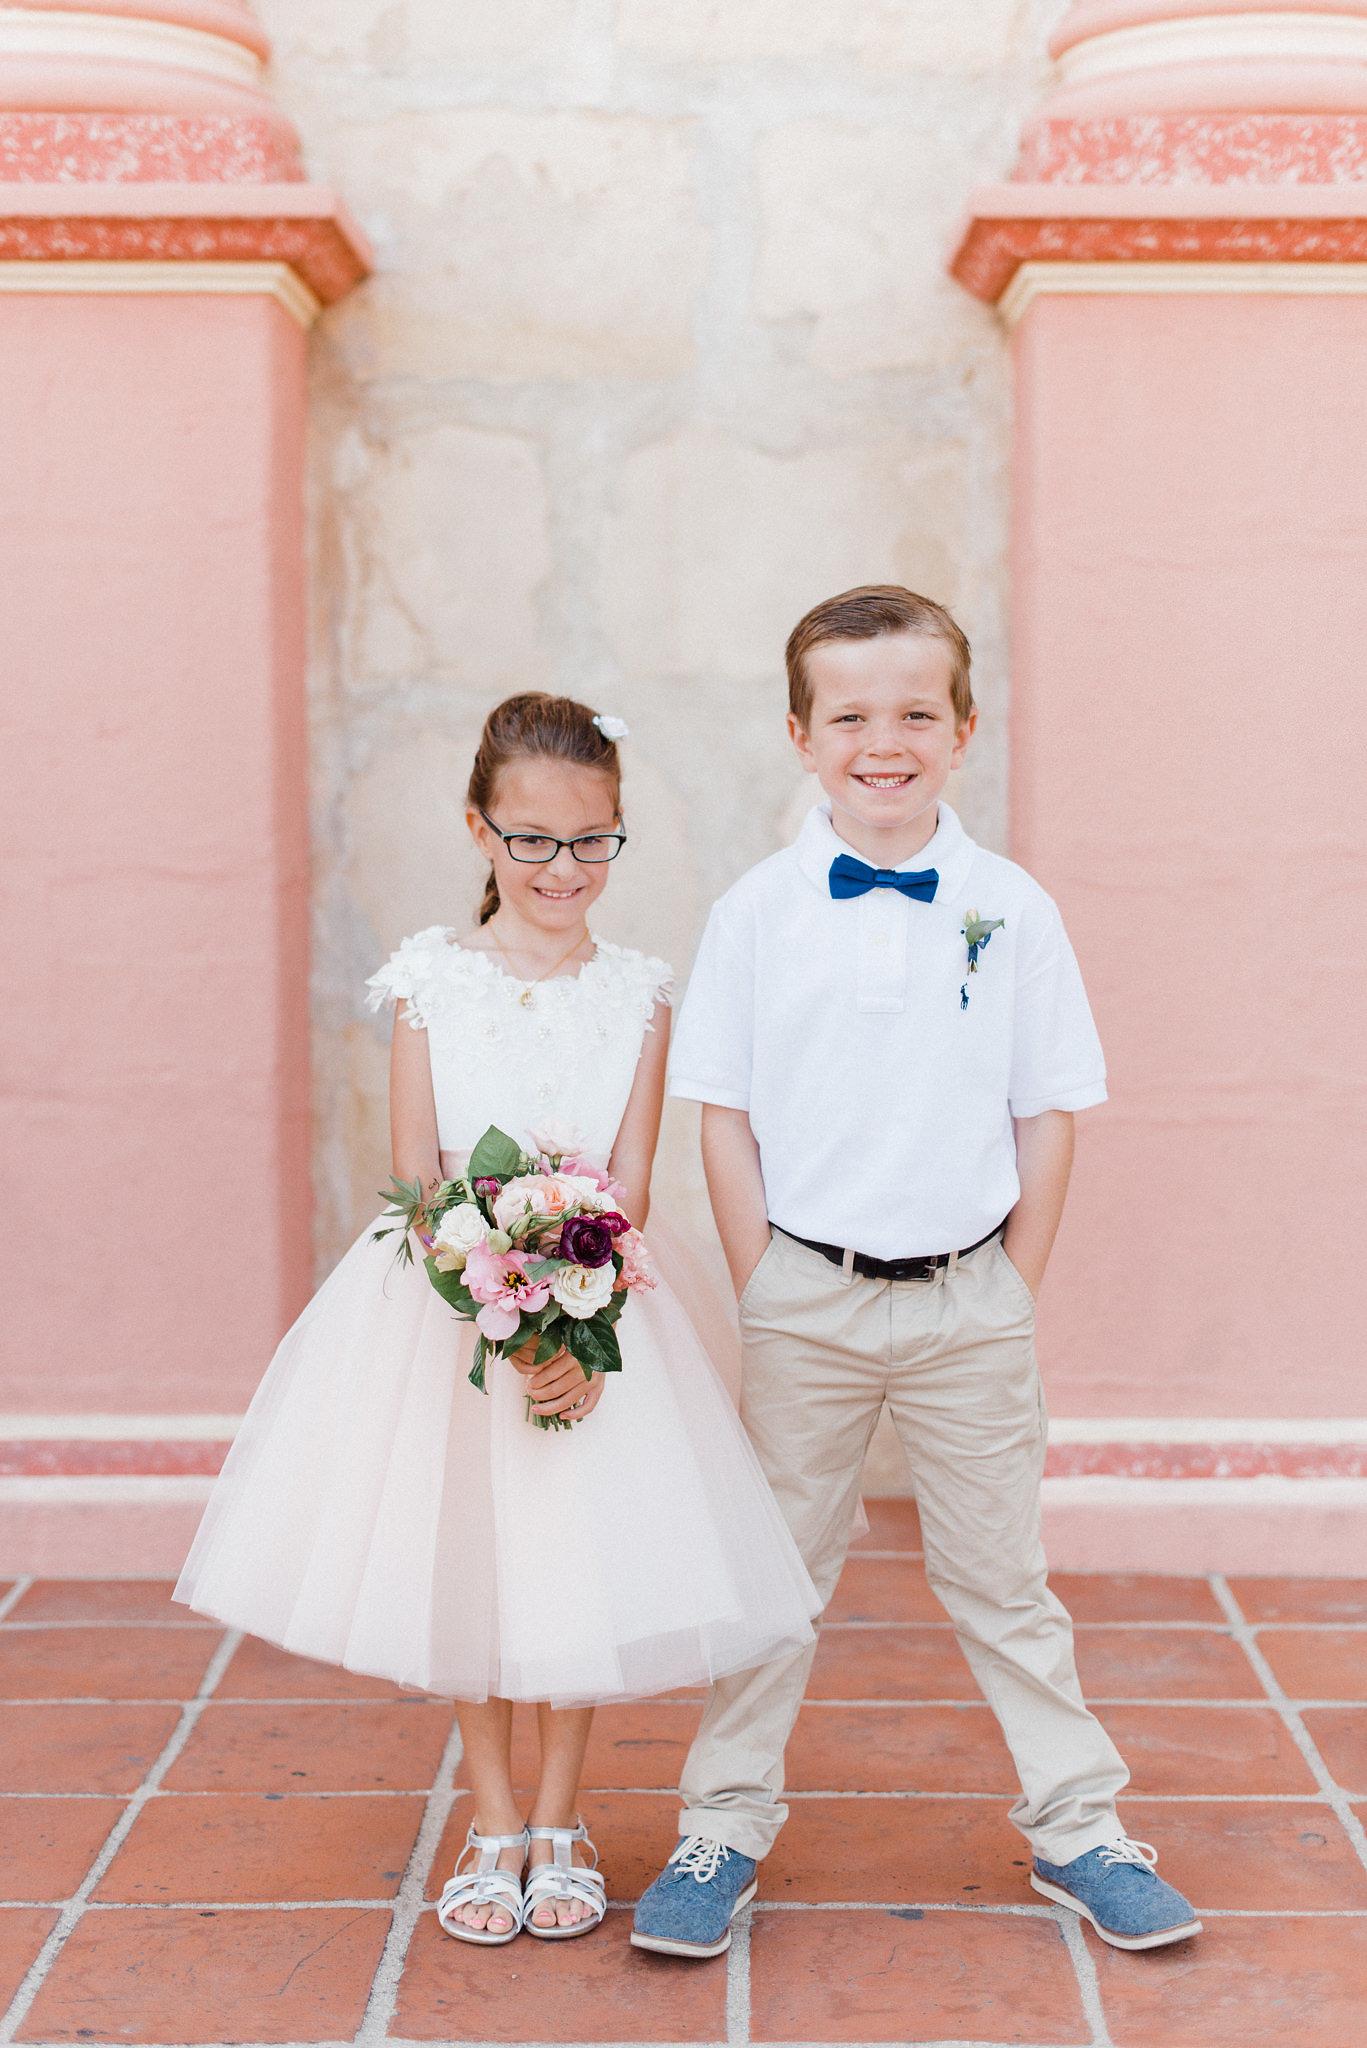 www.santabarbarawedding.com | Canary Hotel | Grace Kathryn Photography | Flower Girl and Ring Bearer